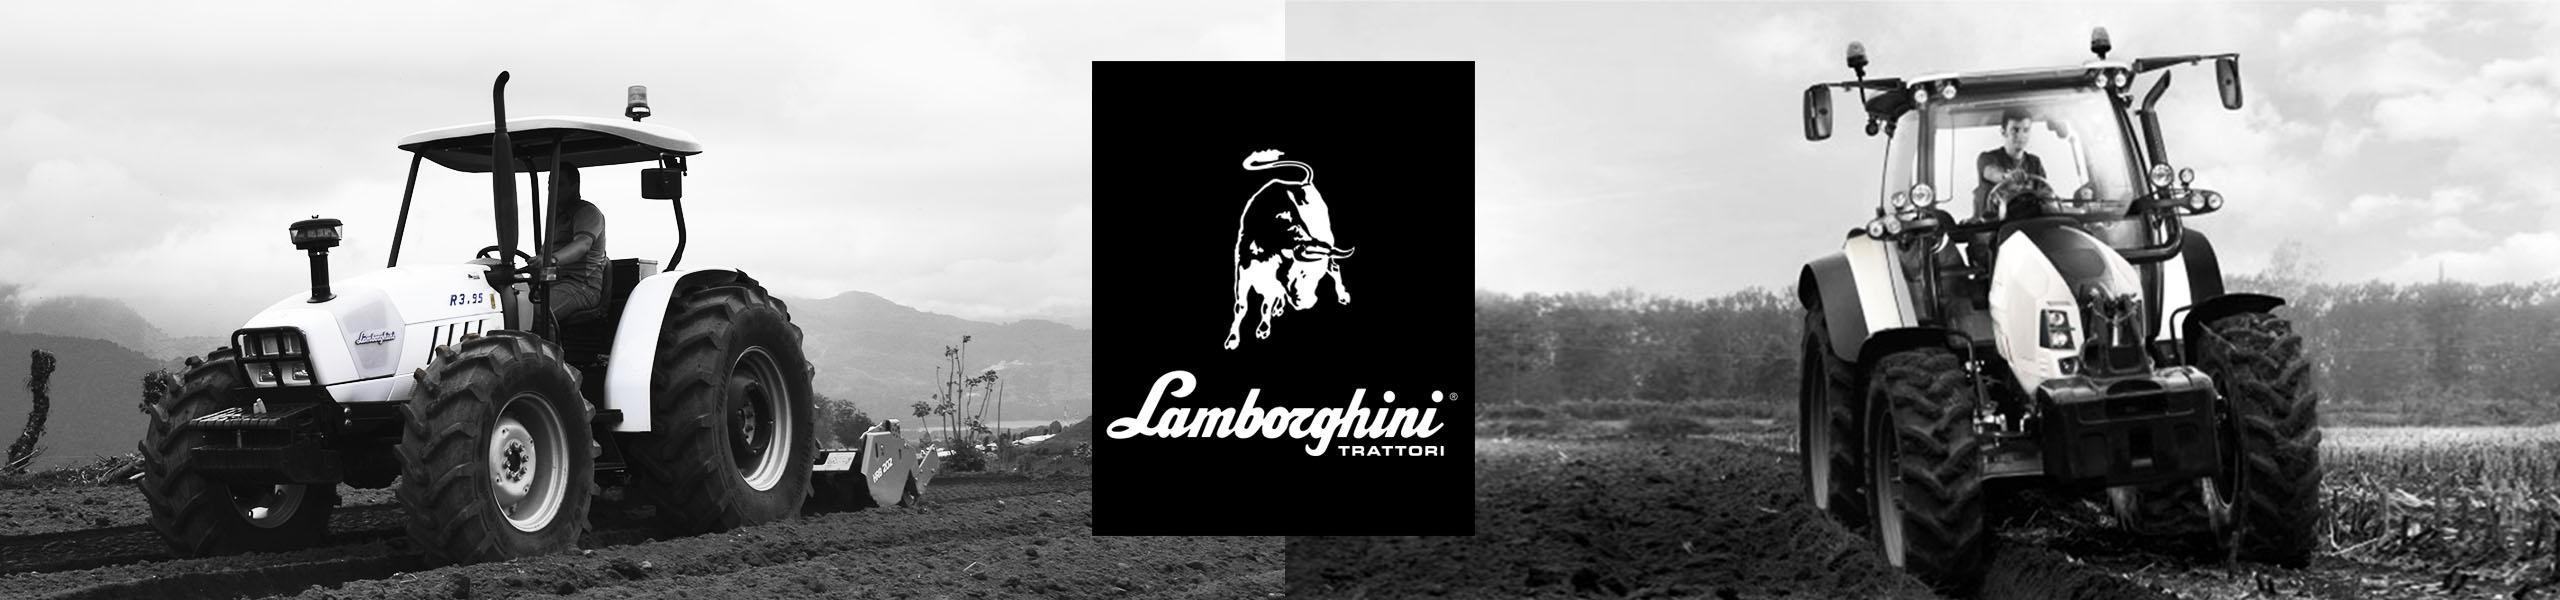 tractores LAMBORGHINI